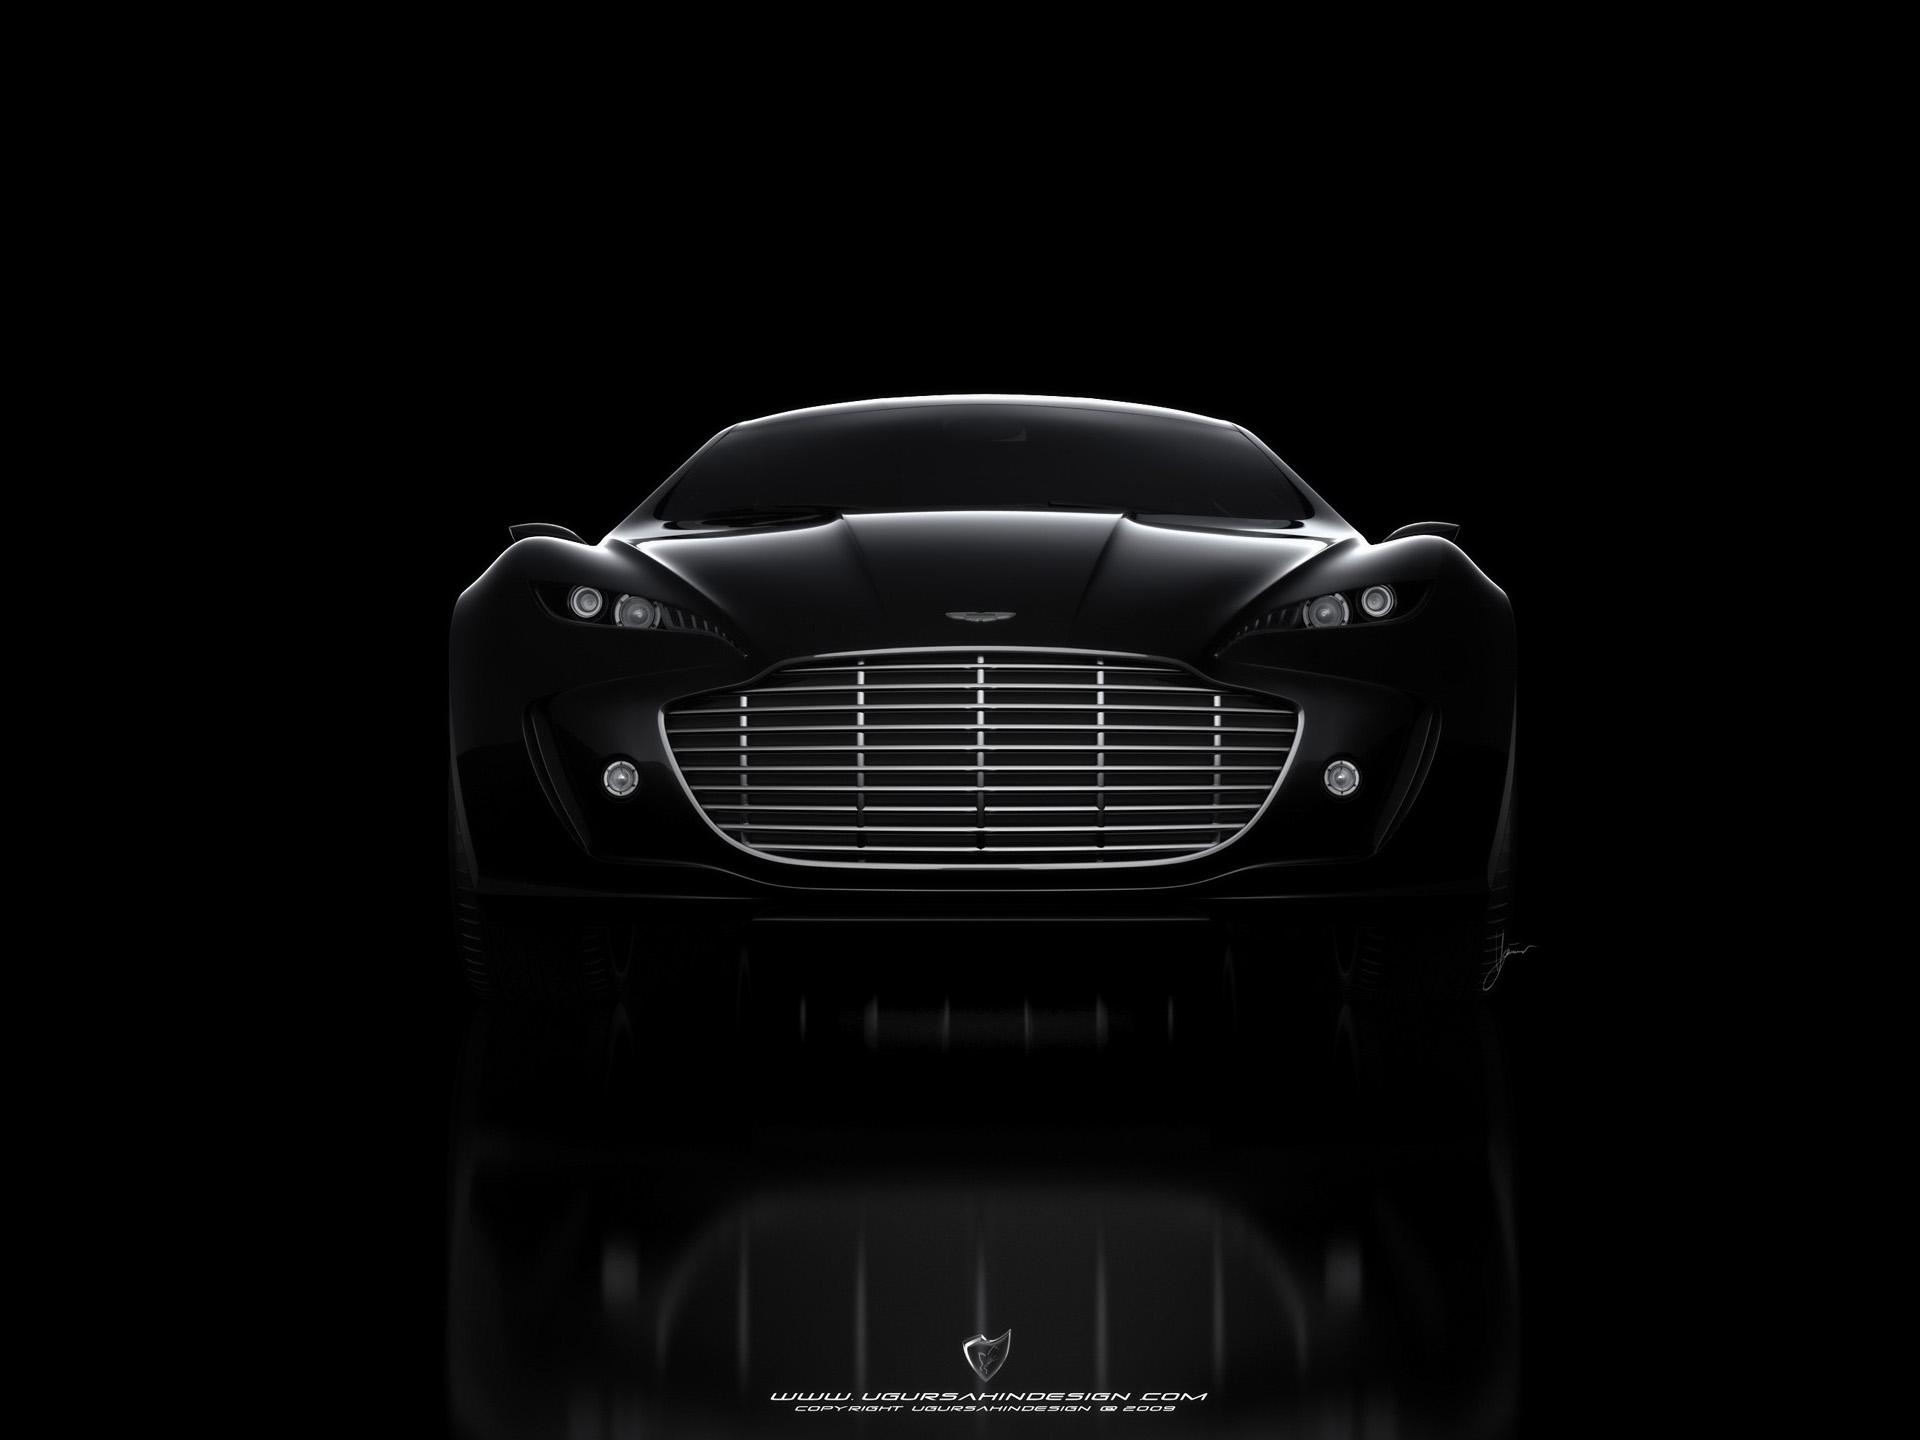 Aston Martin Gauntlet Hd Wallpaper Background Image 1920x1440